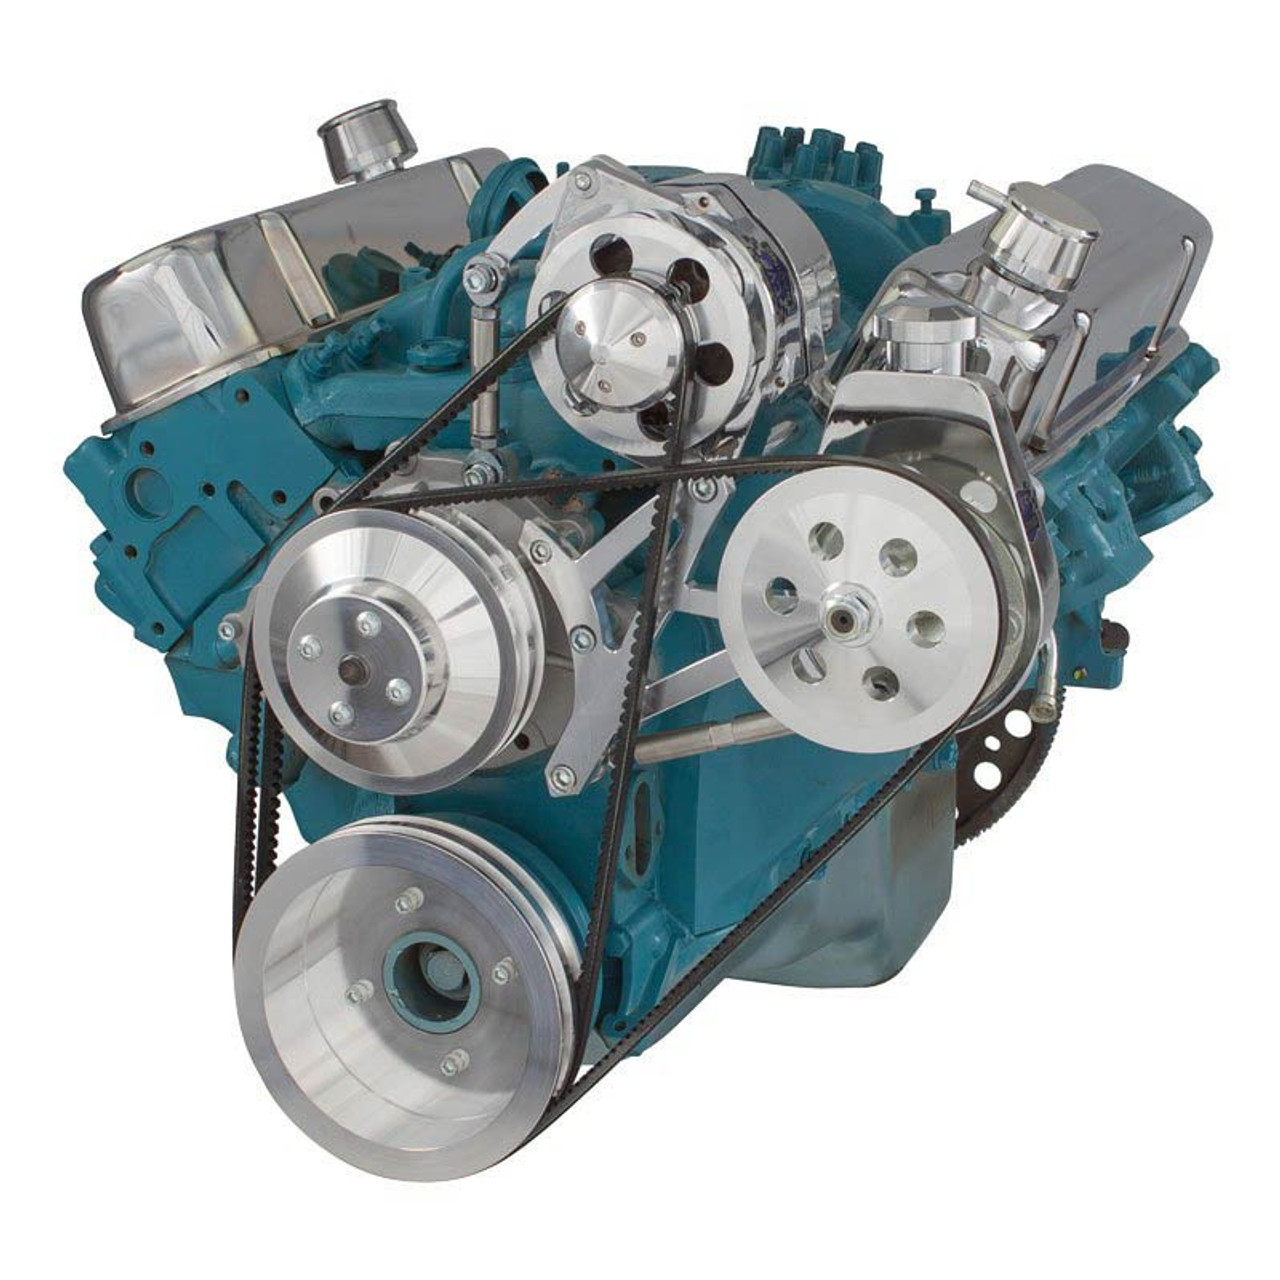 pontiac v belt pulley system 350 400 428 455 rh cvfracing com Pontiac Serpentine Belt 2001 Serpentine Diagram for Pontiac Sunfire